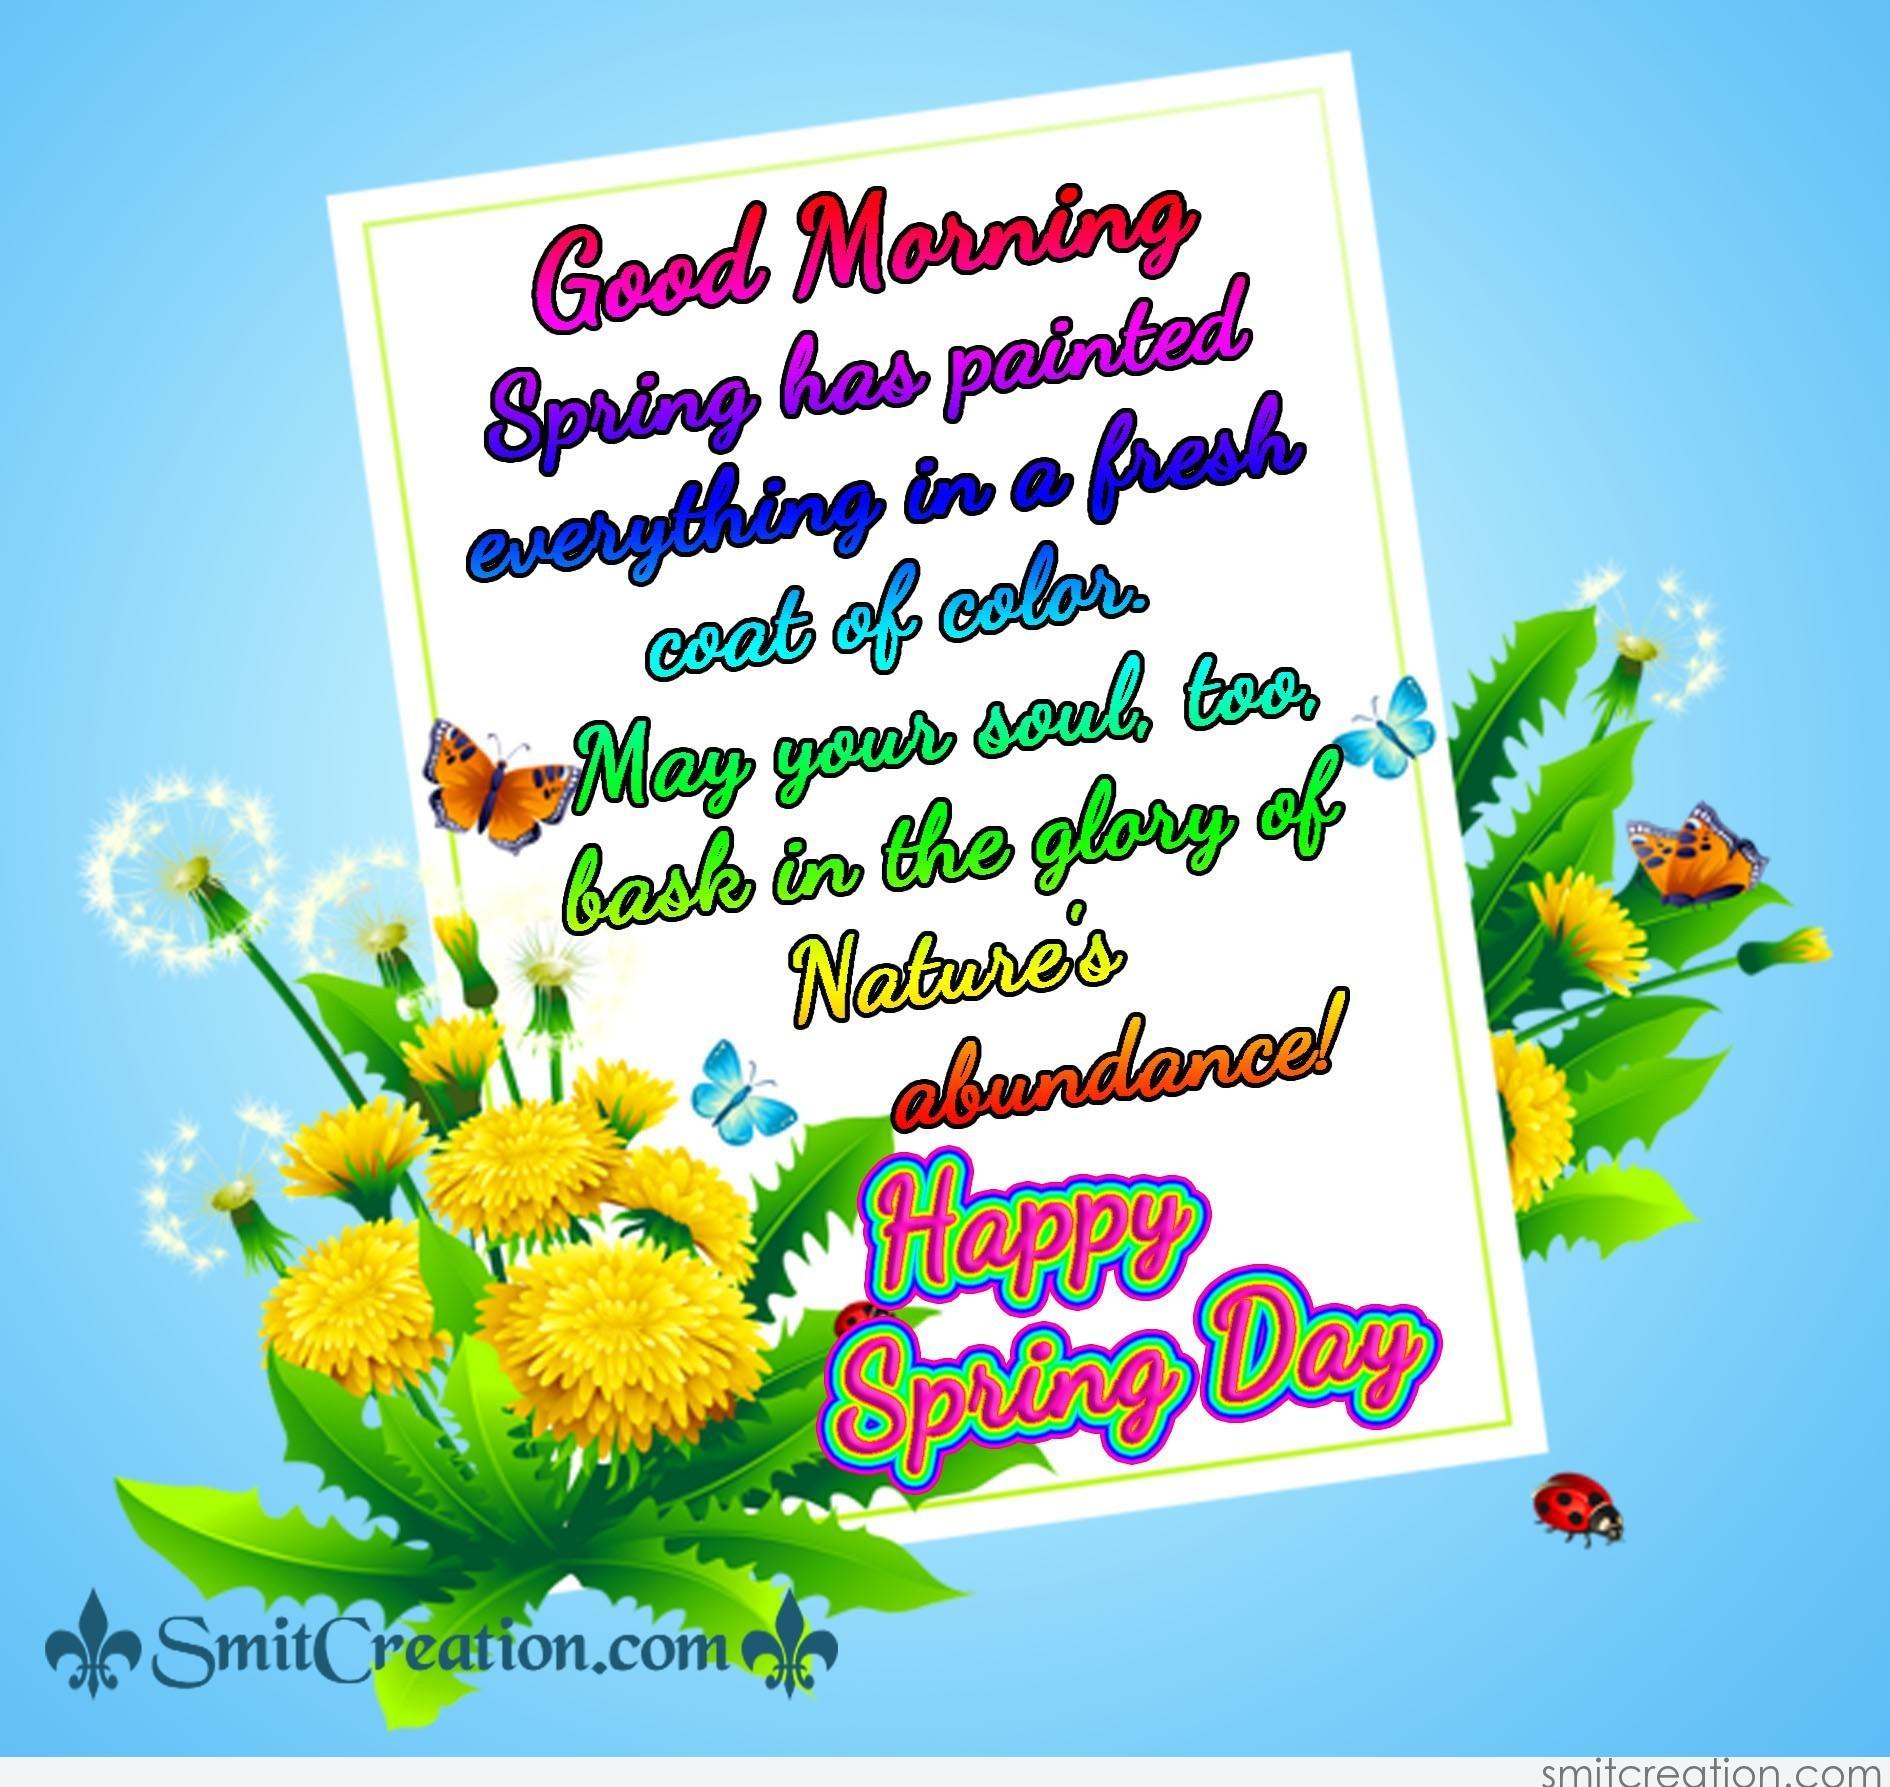 Good Morning Happy Spring Day - SmitCreation.com